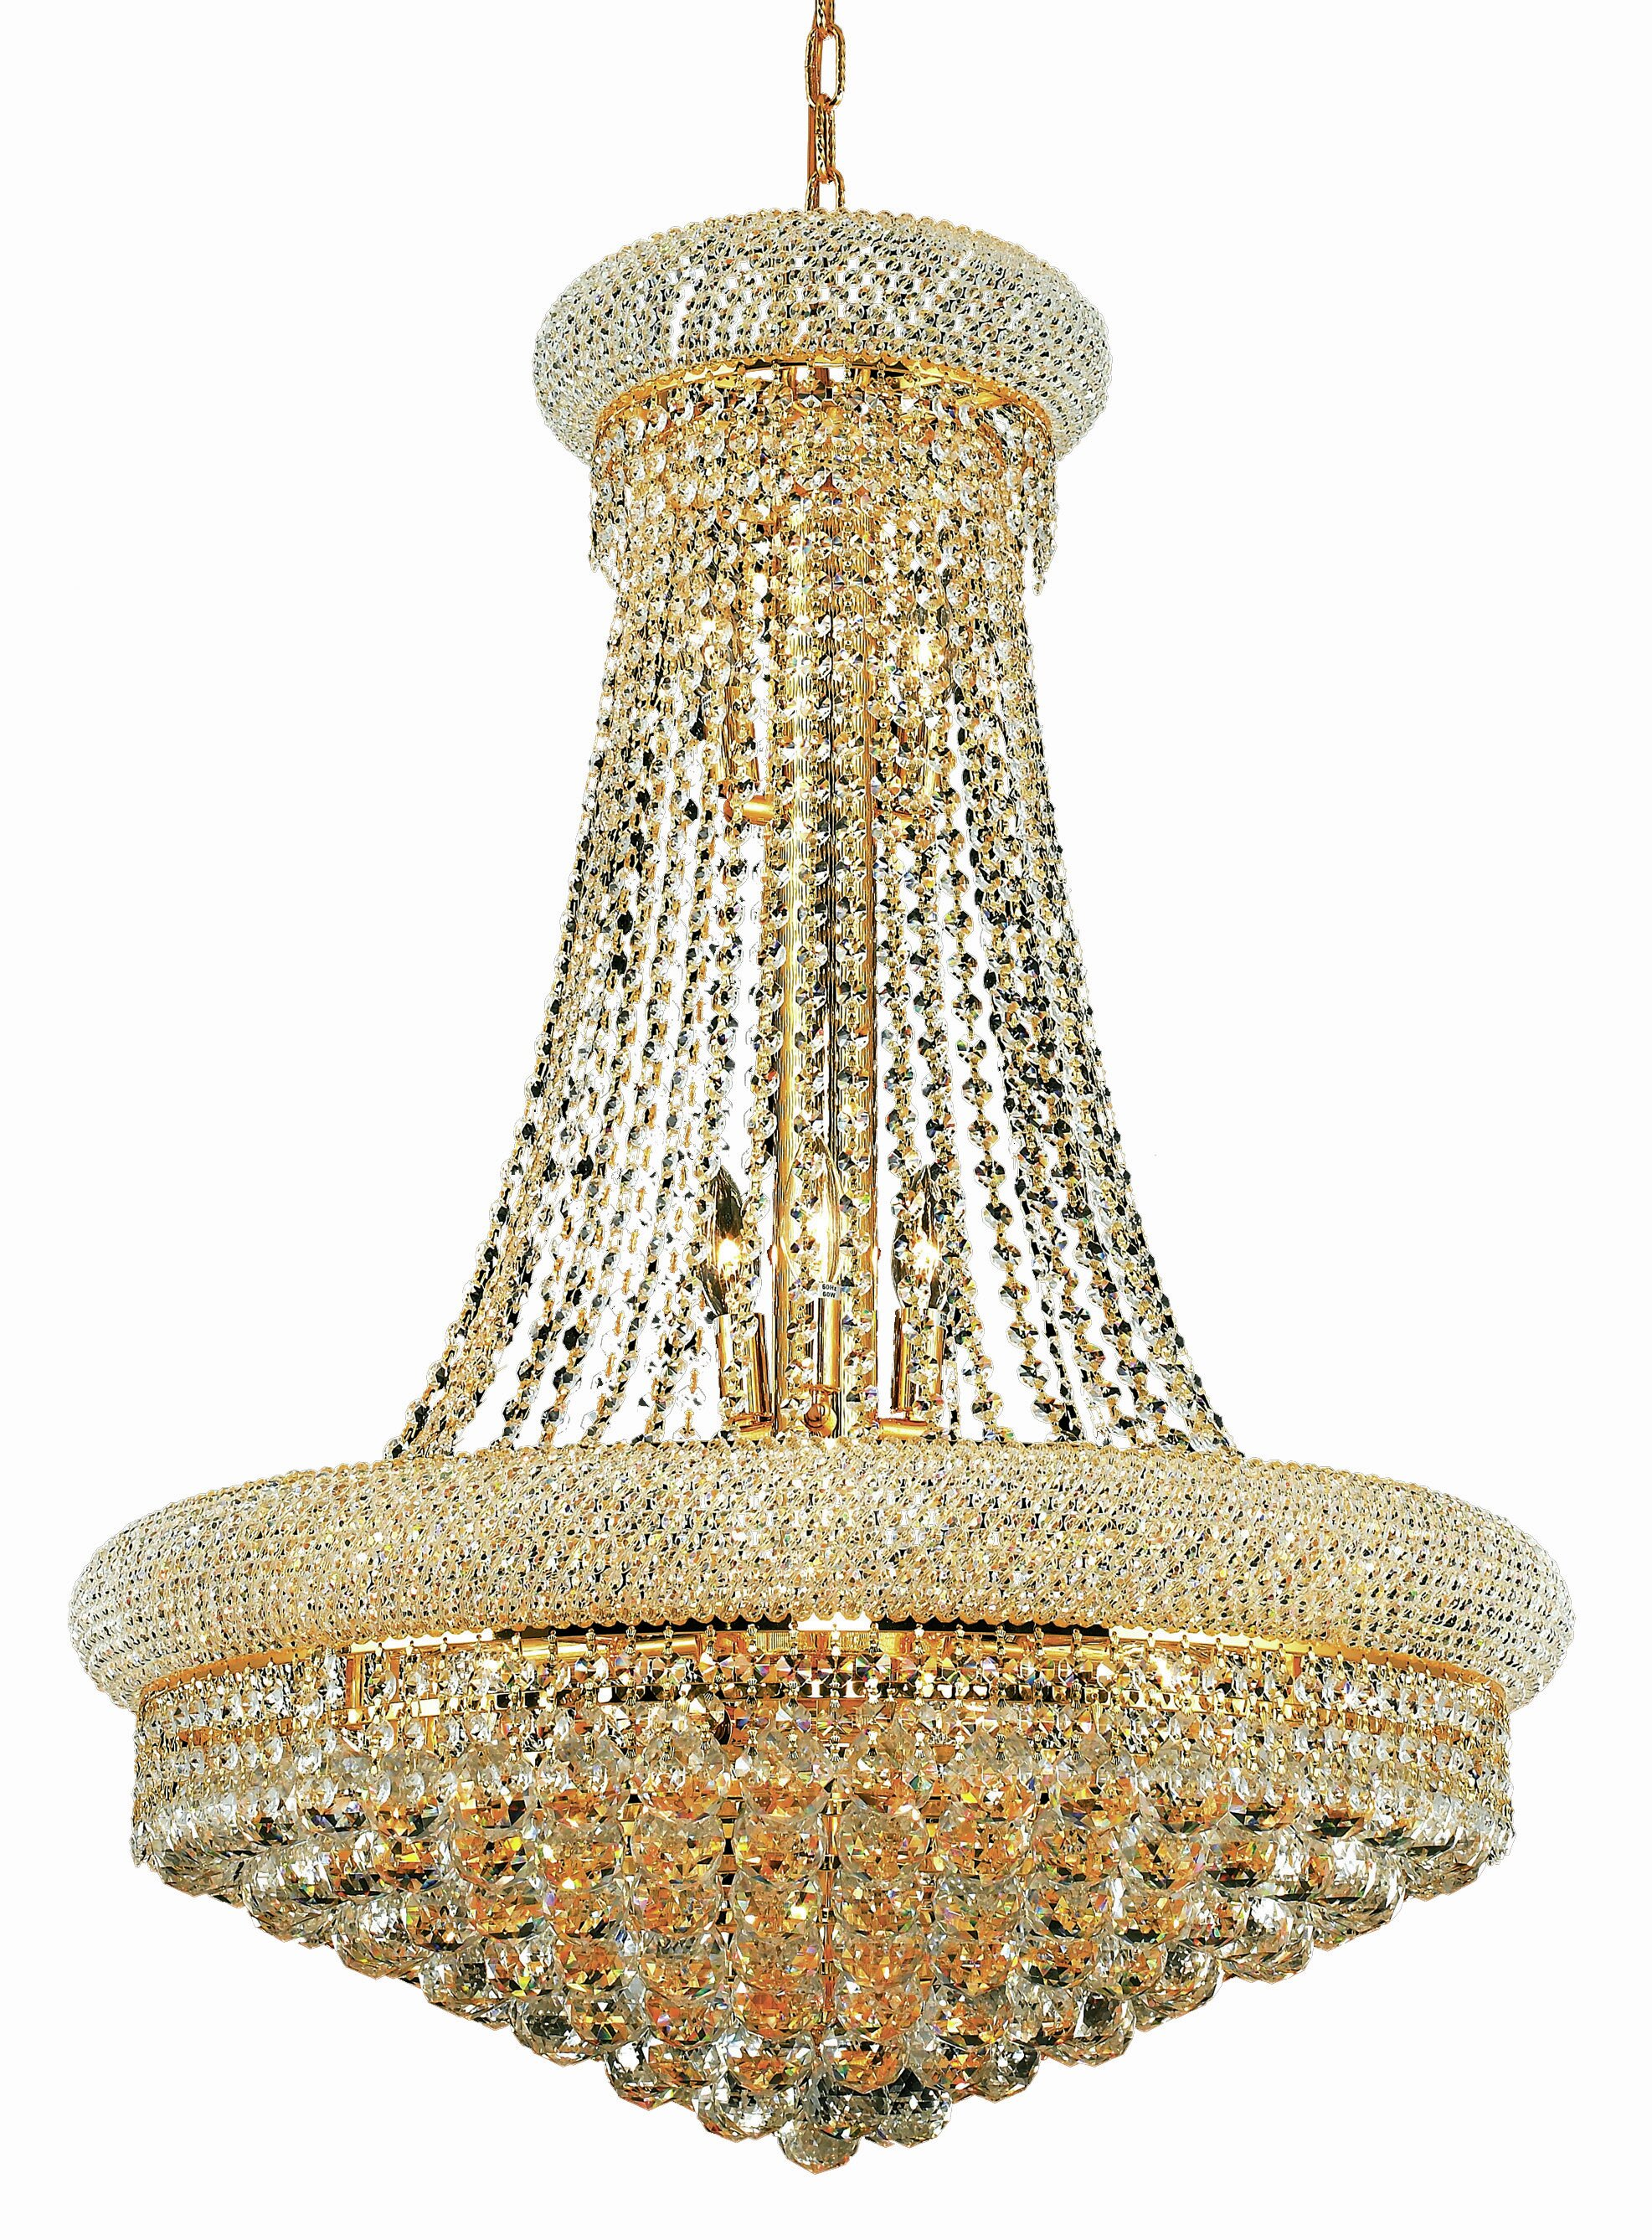 Willa Arlo Interiors Destanee 14 Light Empire Chandelier & Reviews